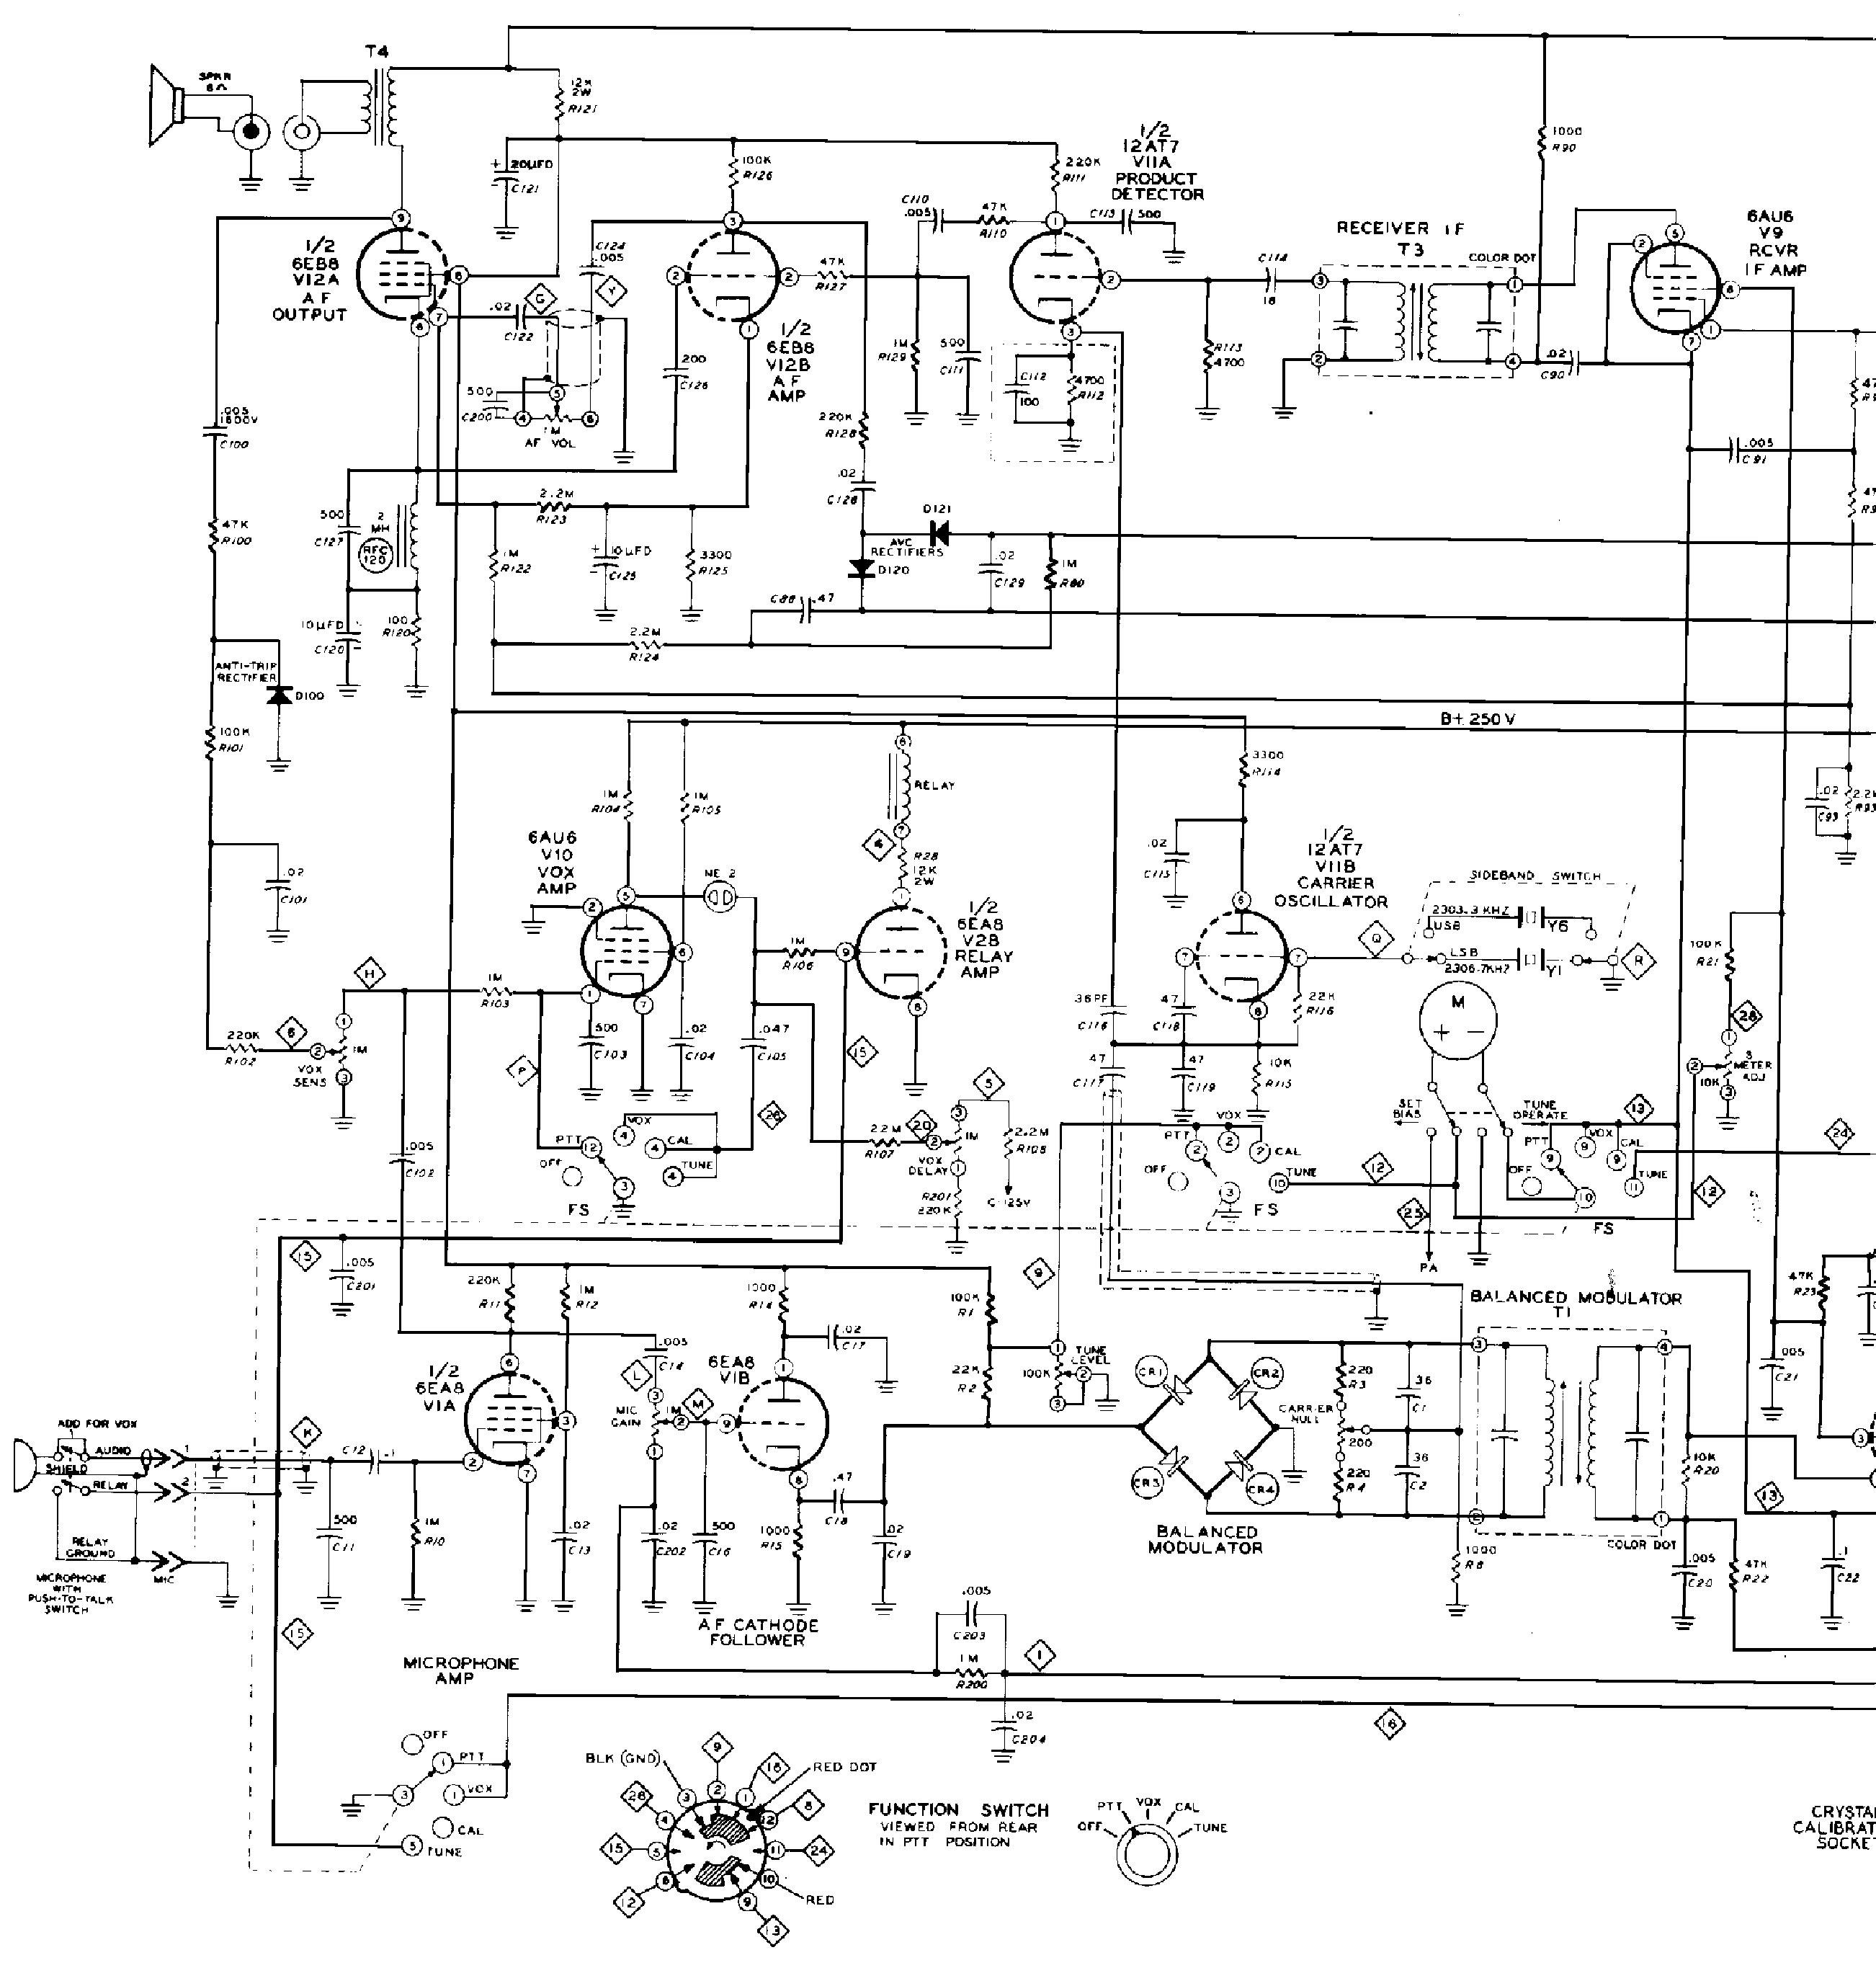 Heathkit Meter manual